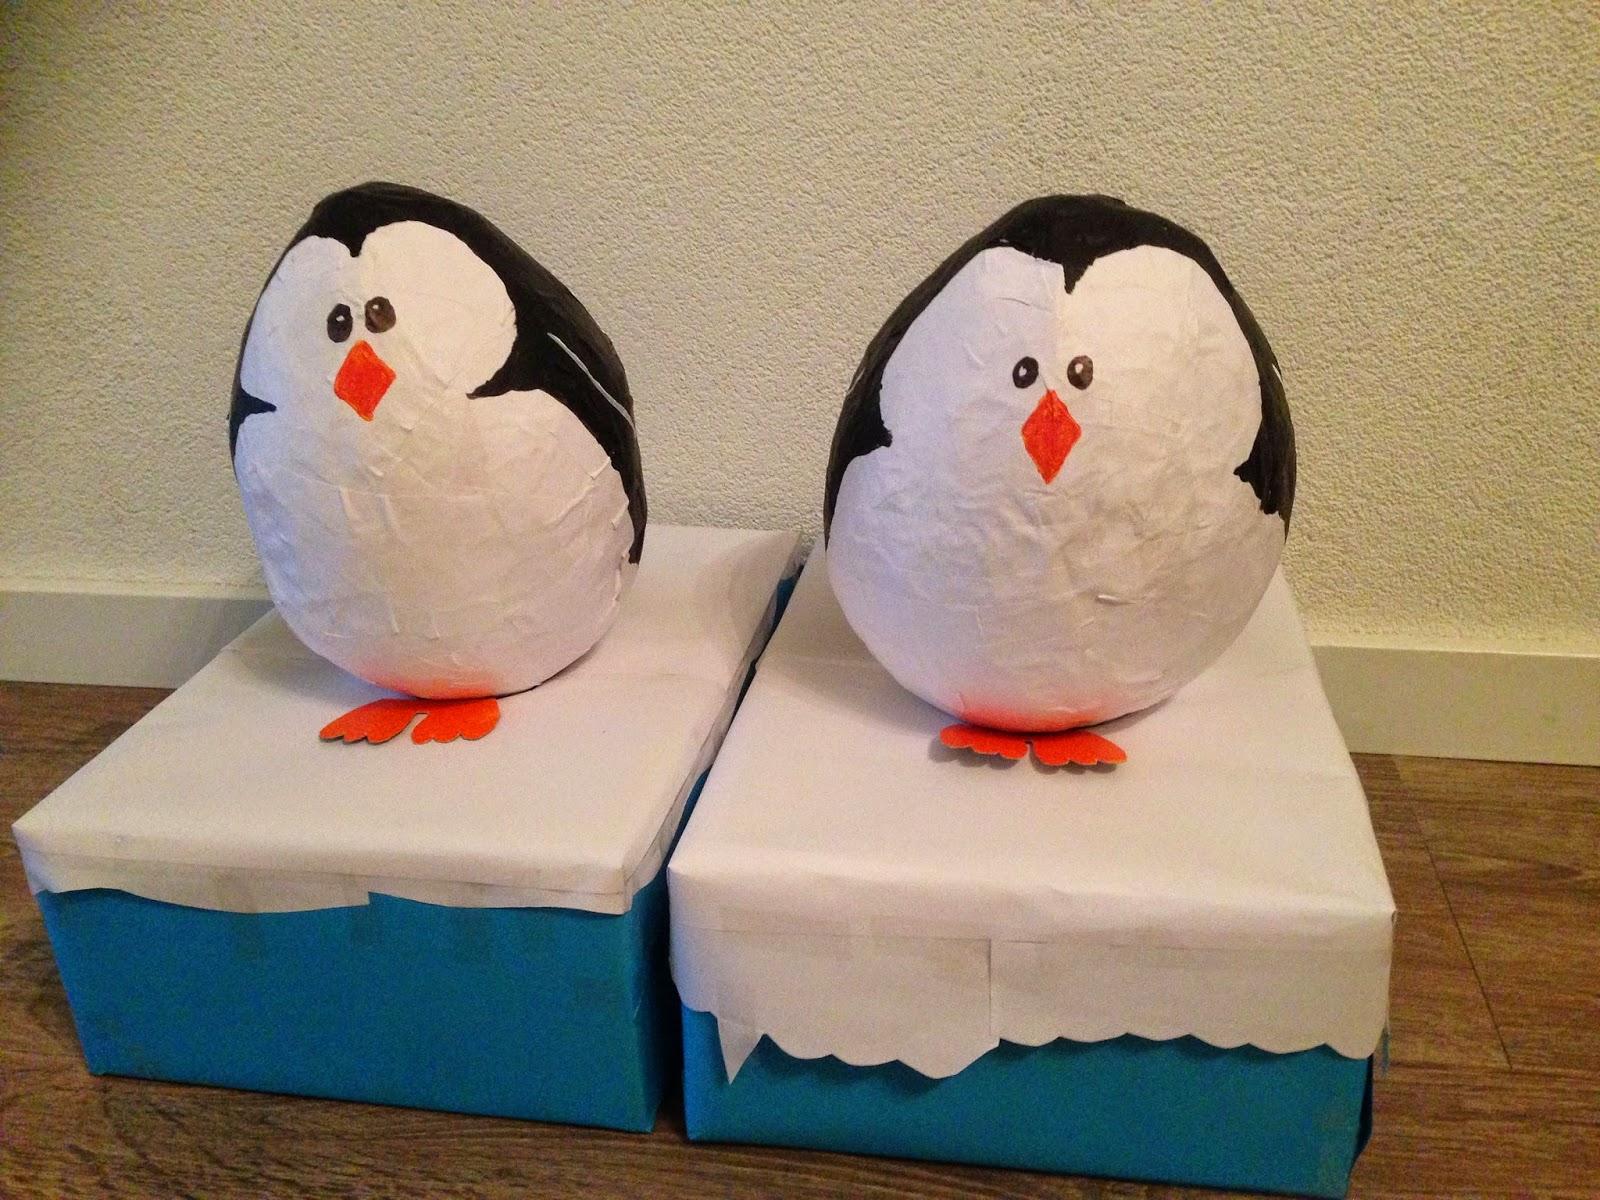 Pinguin surprise